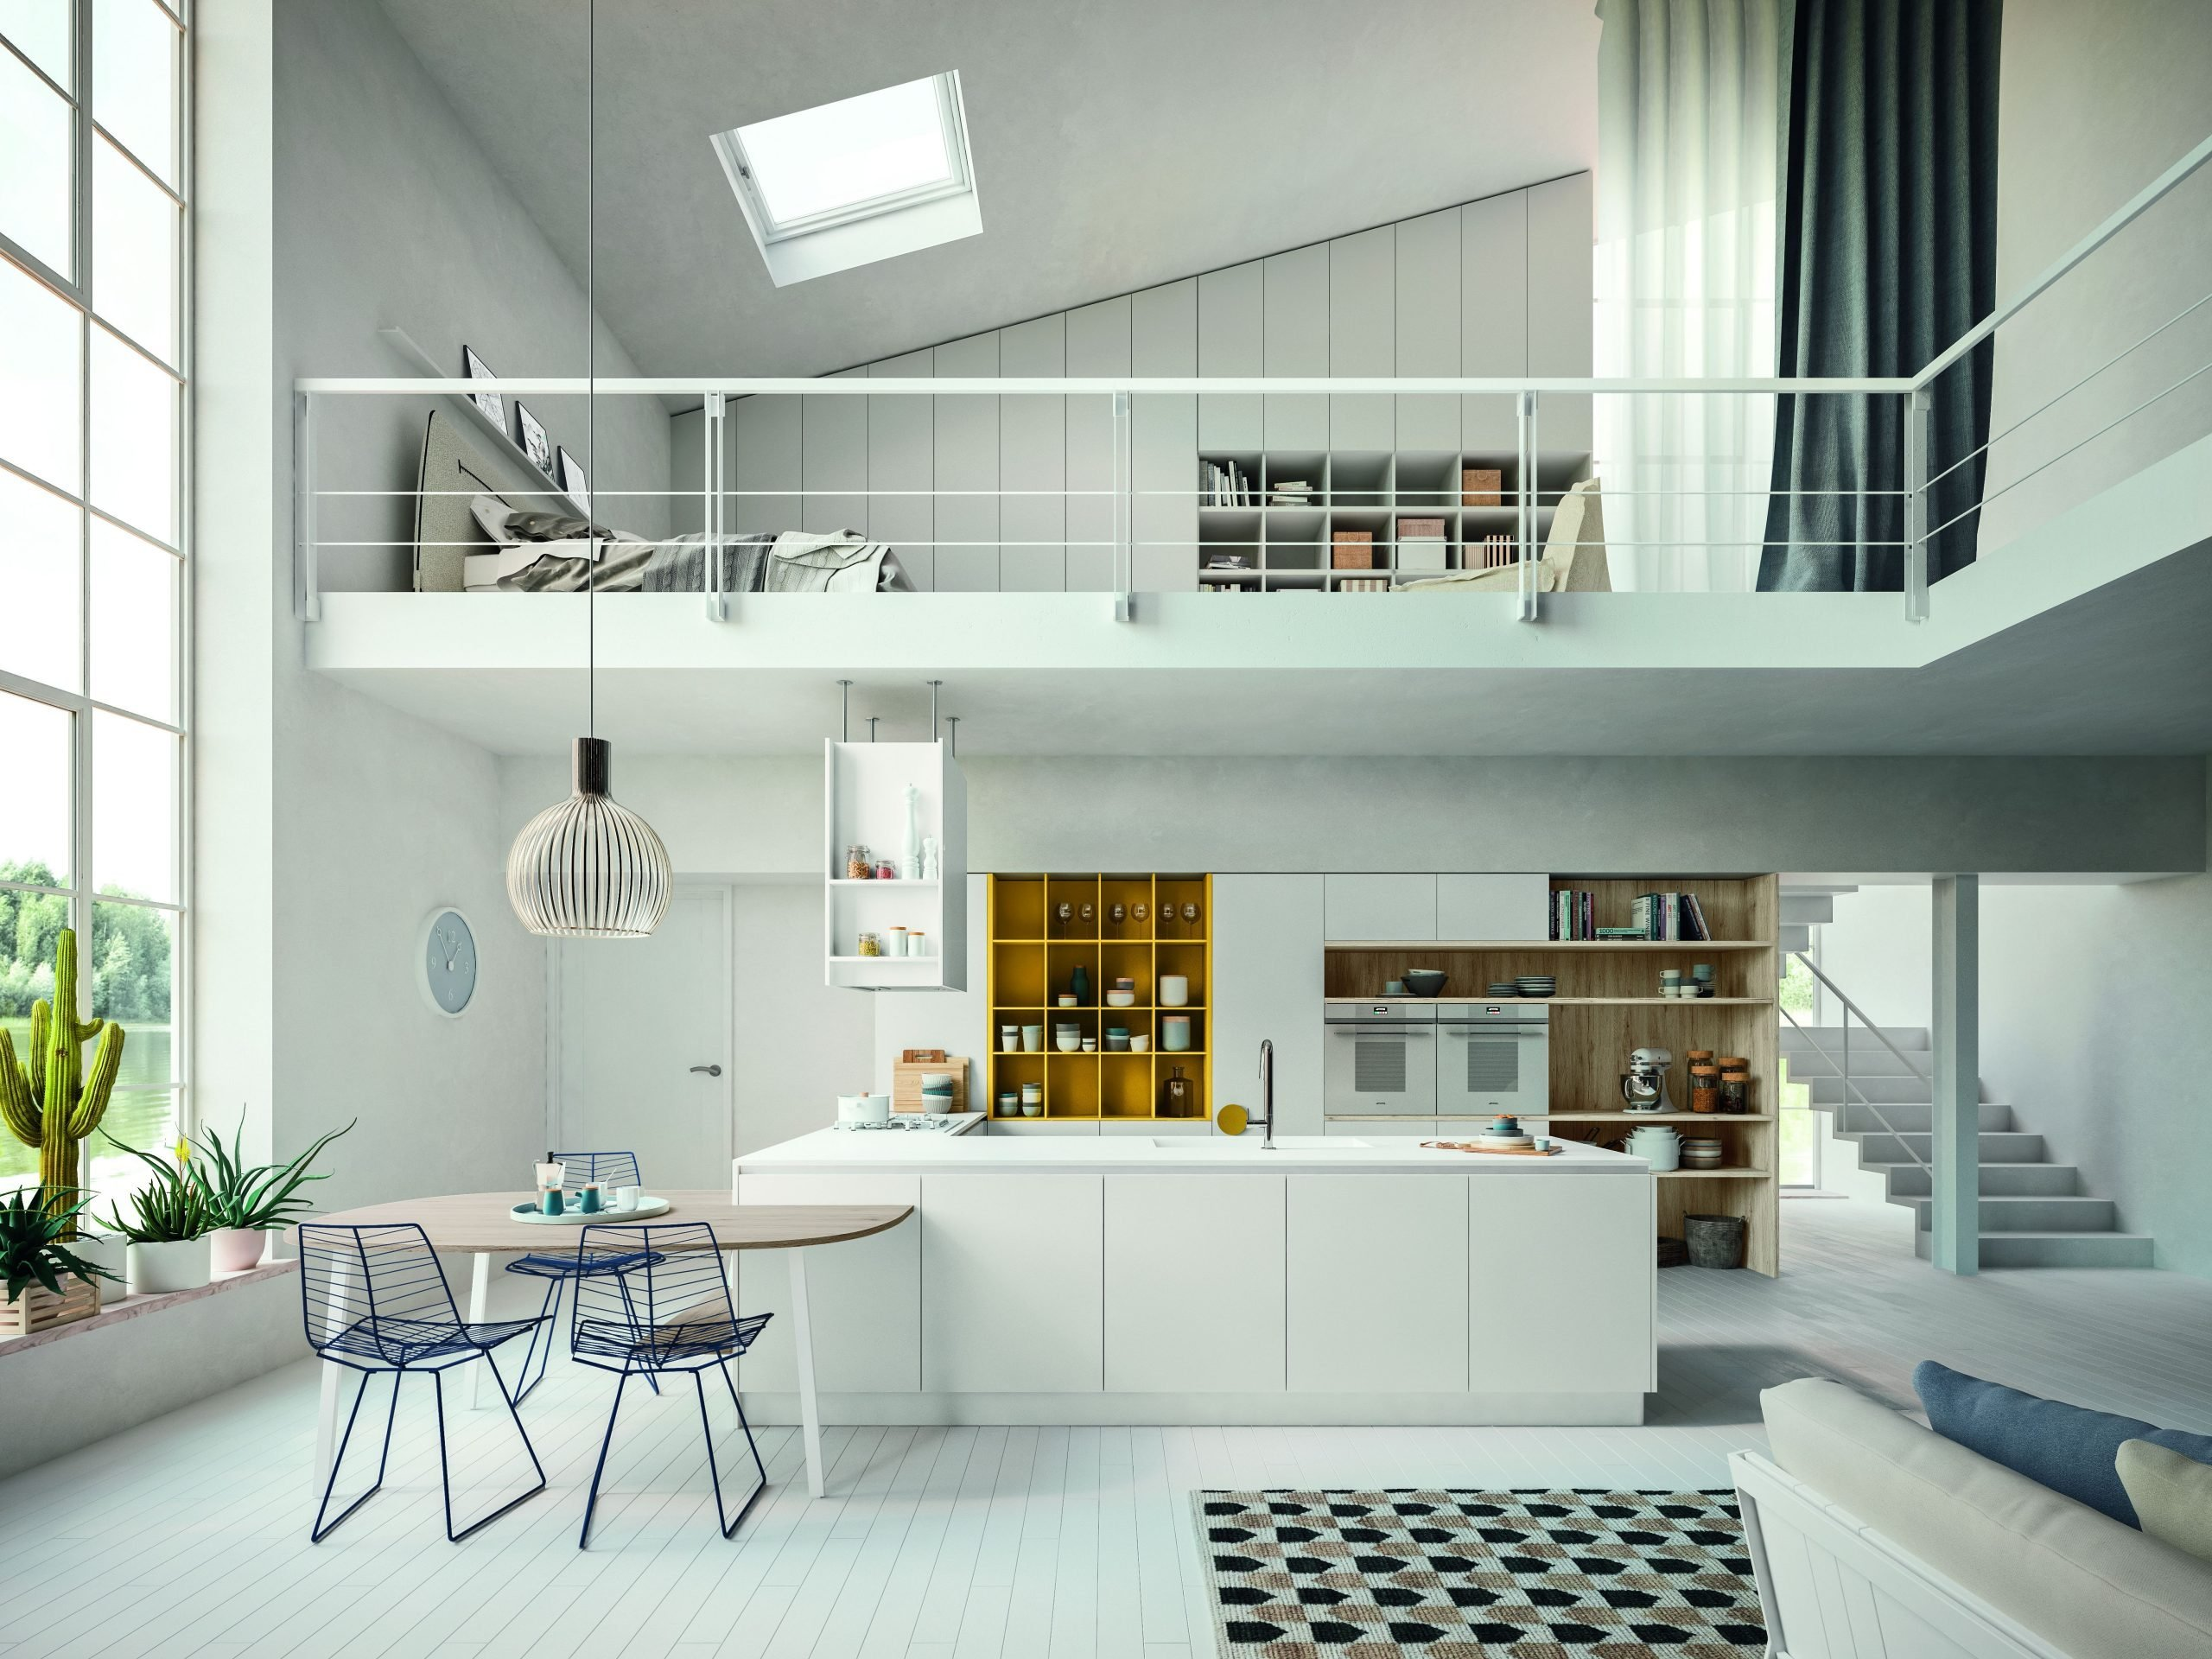 cucina bianca moderna in laccato opaco, open space.